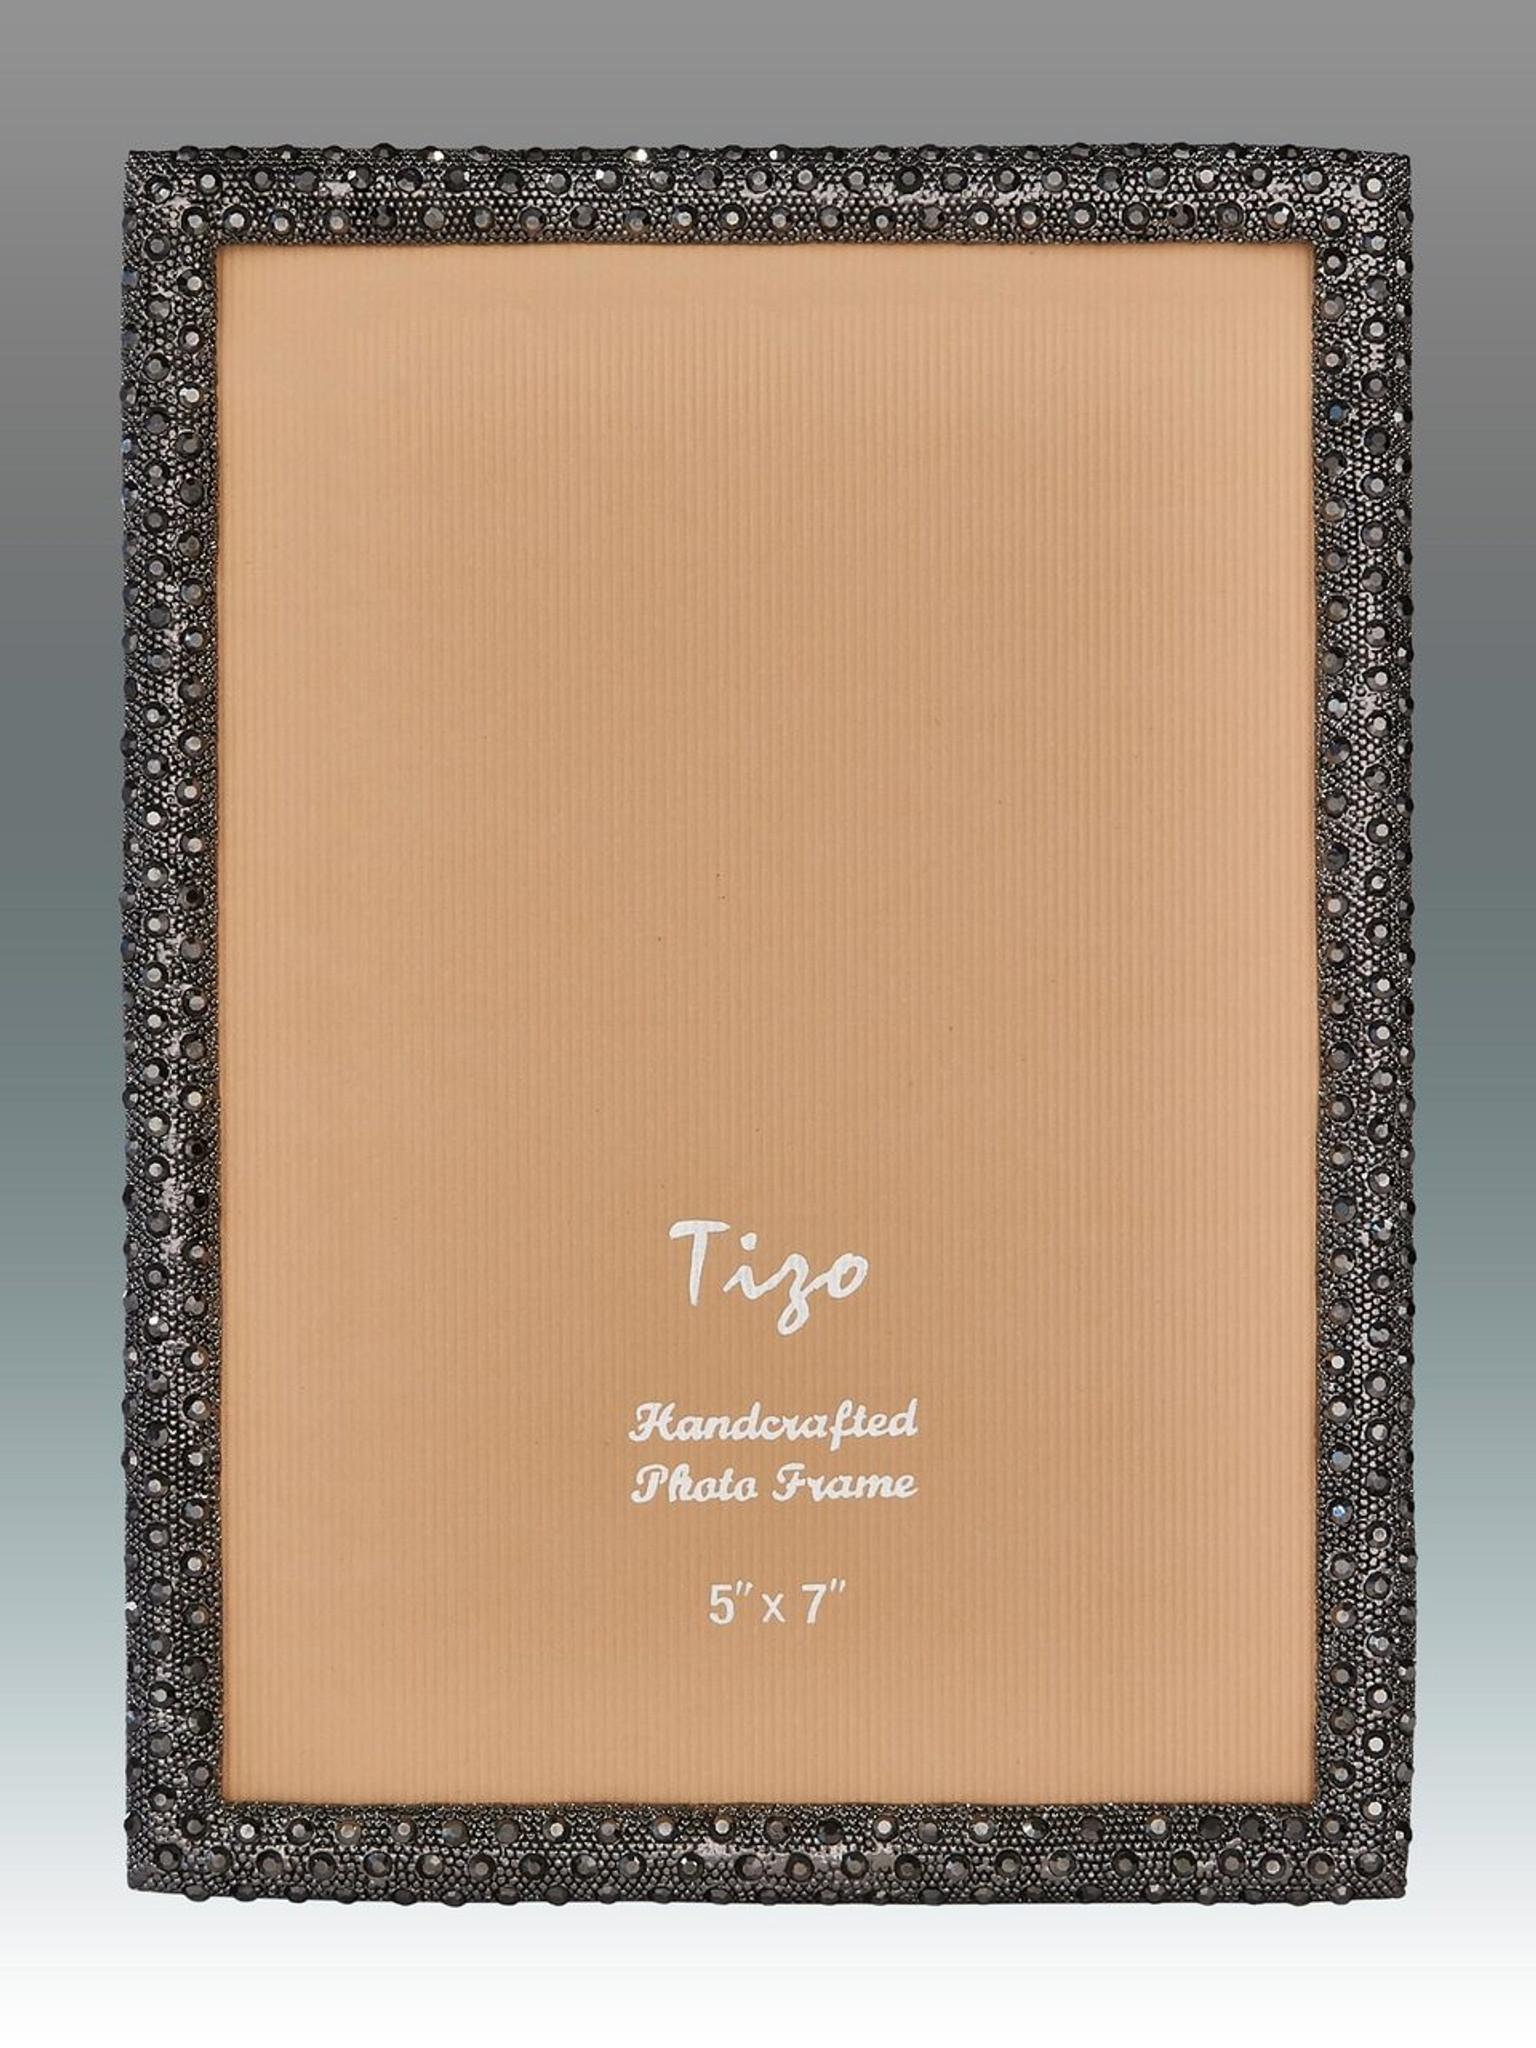 Tizo Shamoo Jeweled Black Picture Frame 4 x 6 Inch - HomeBello